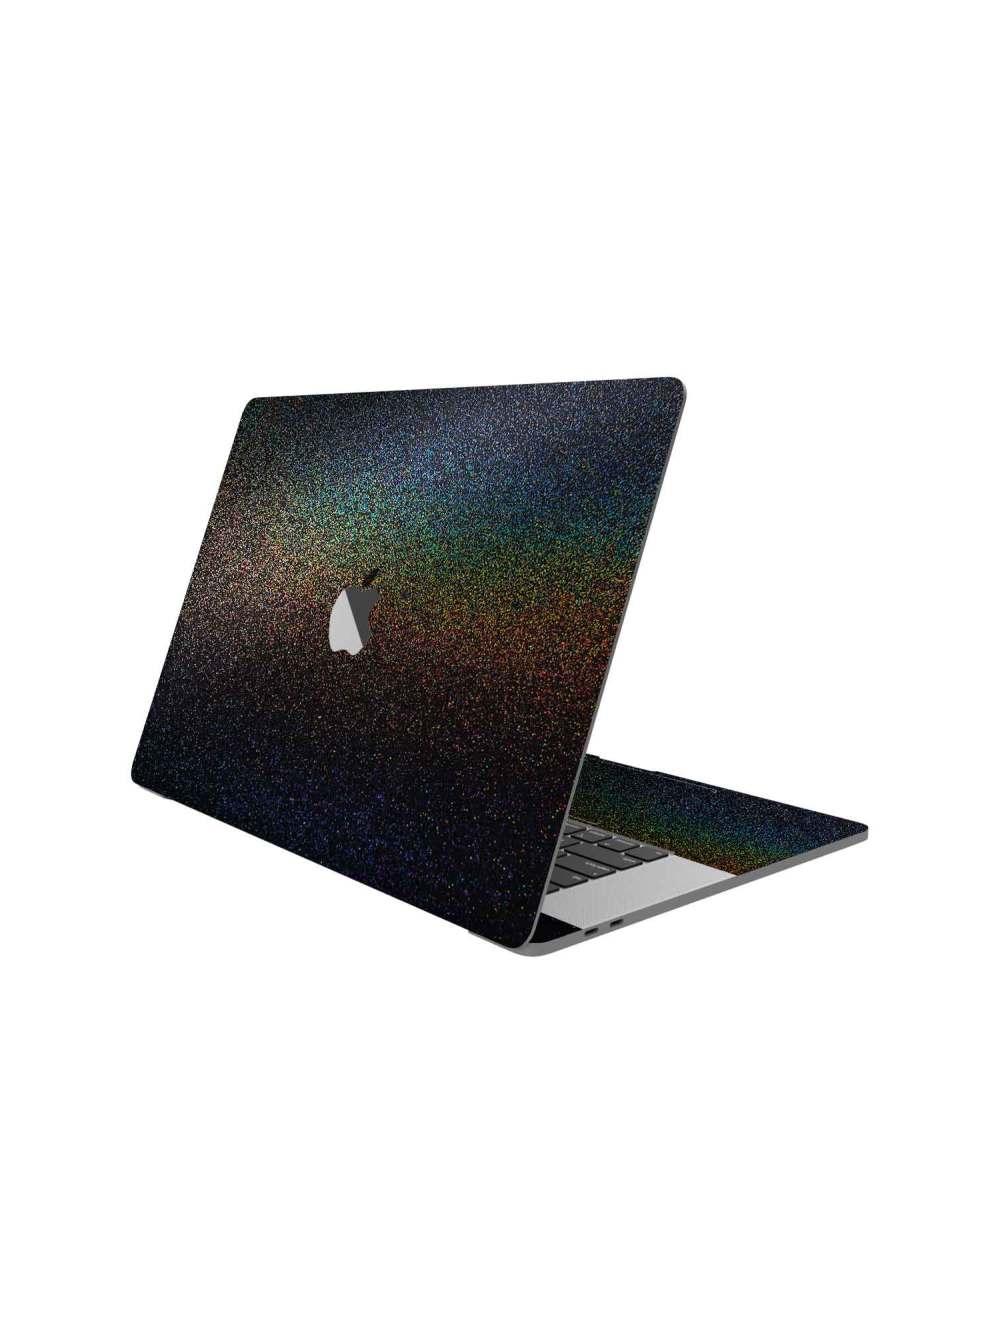 Cosmic Morpheus Skin Macbook Pro M1 Skin Wrap Cover